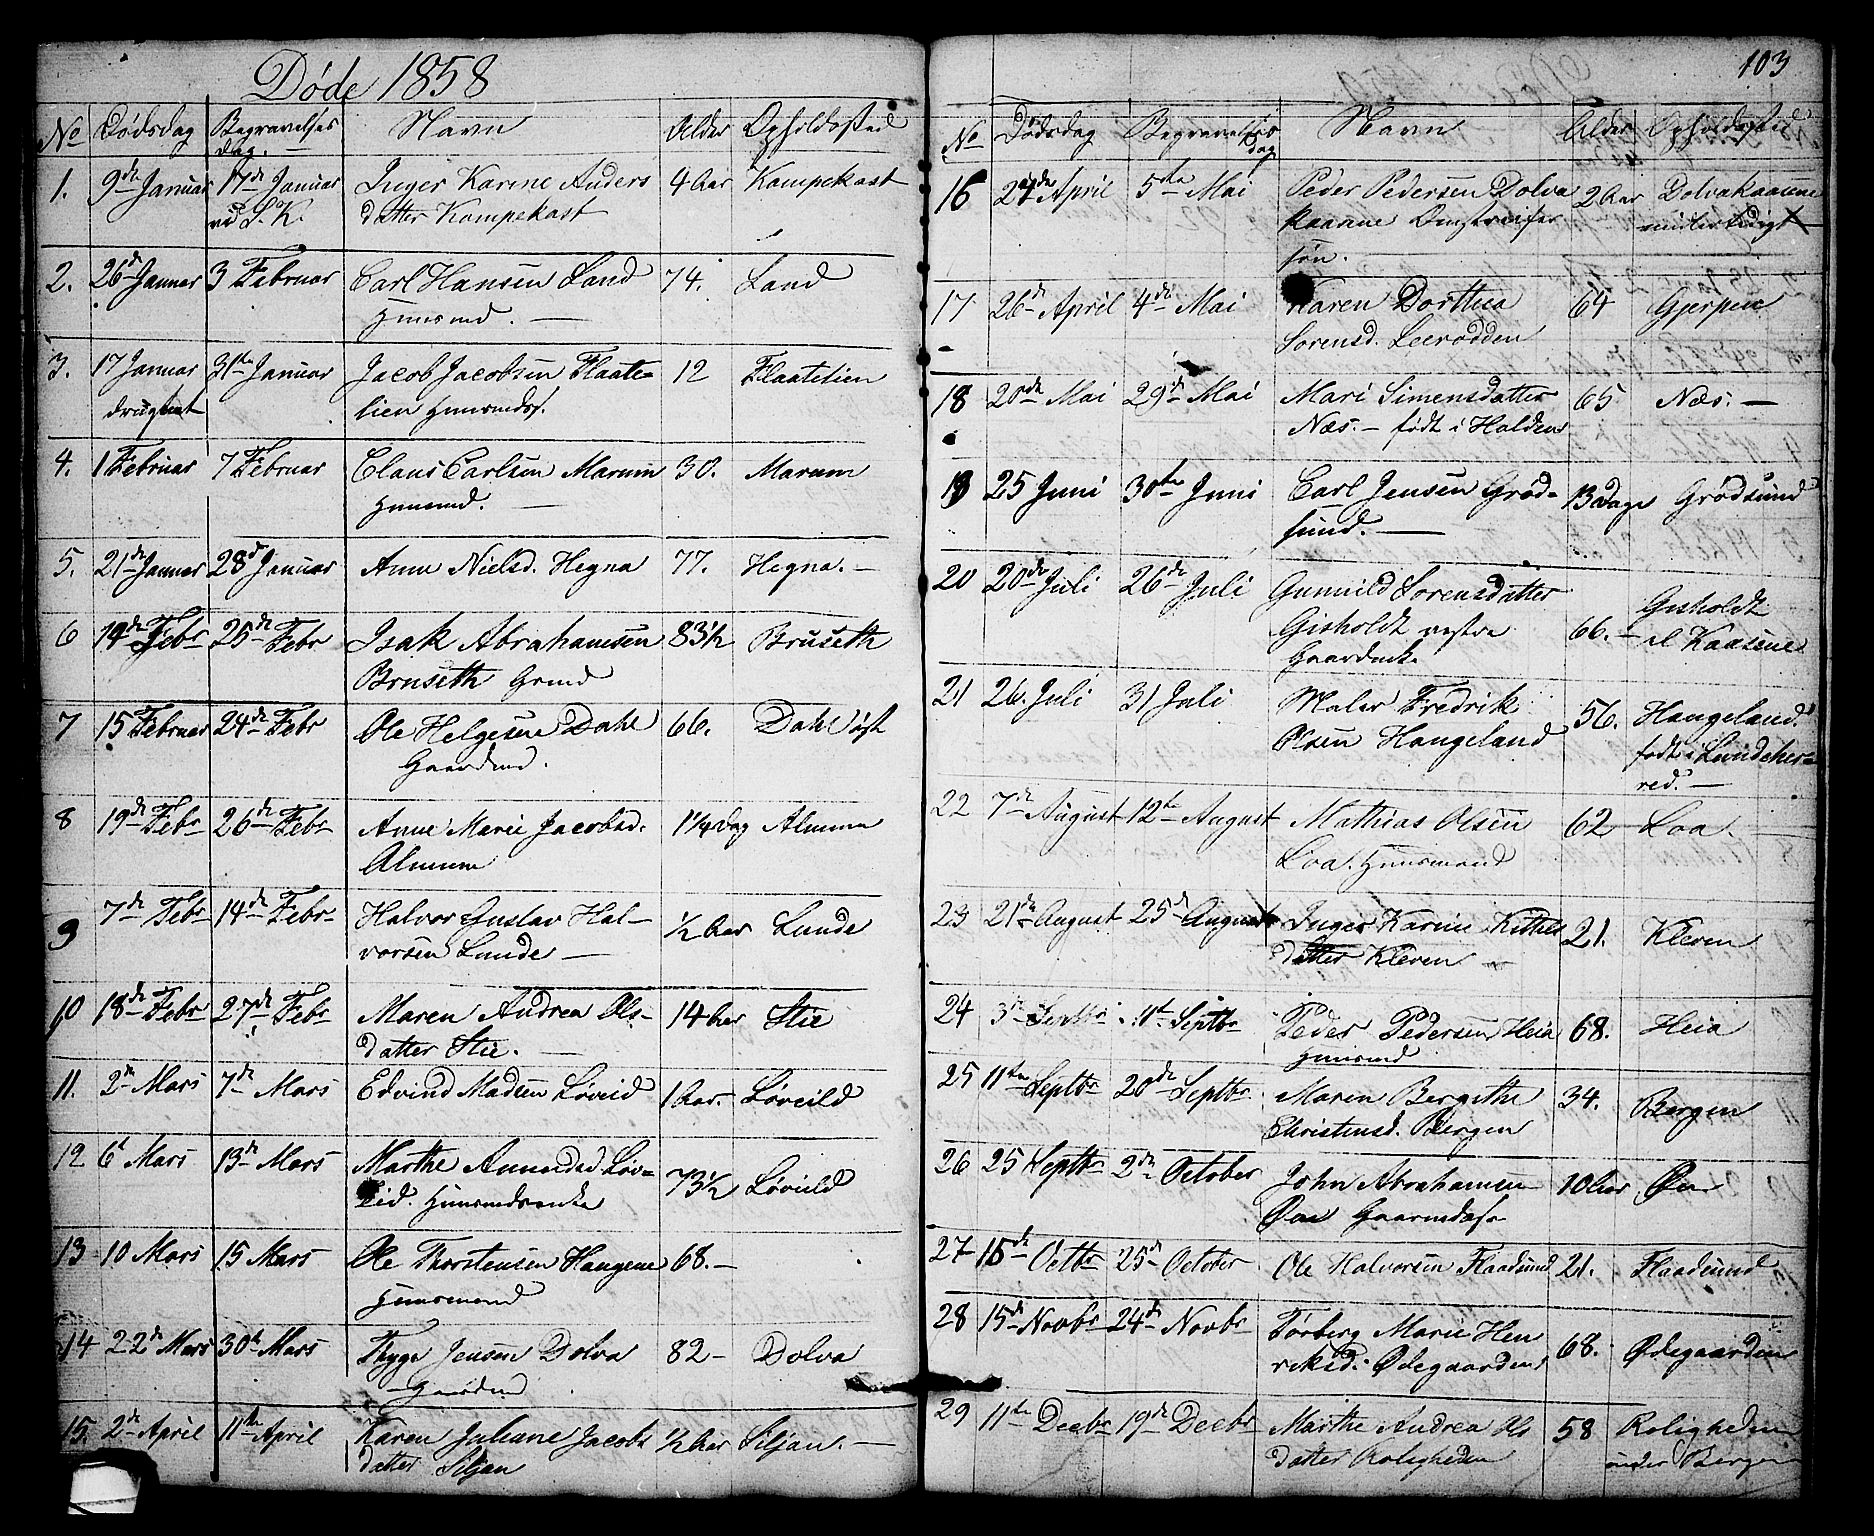 SAKO, Solum kirkebøker, G/Gb/L0001: Klokkerbok nr. II 1, 1848-1859, s. 103